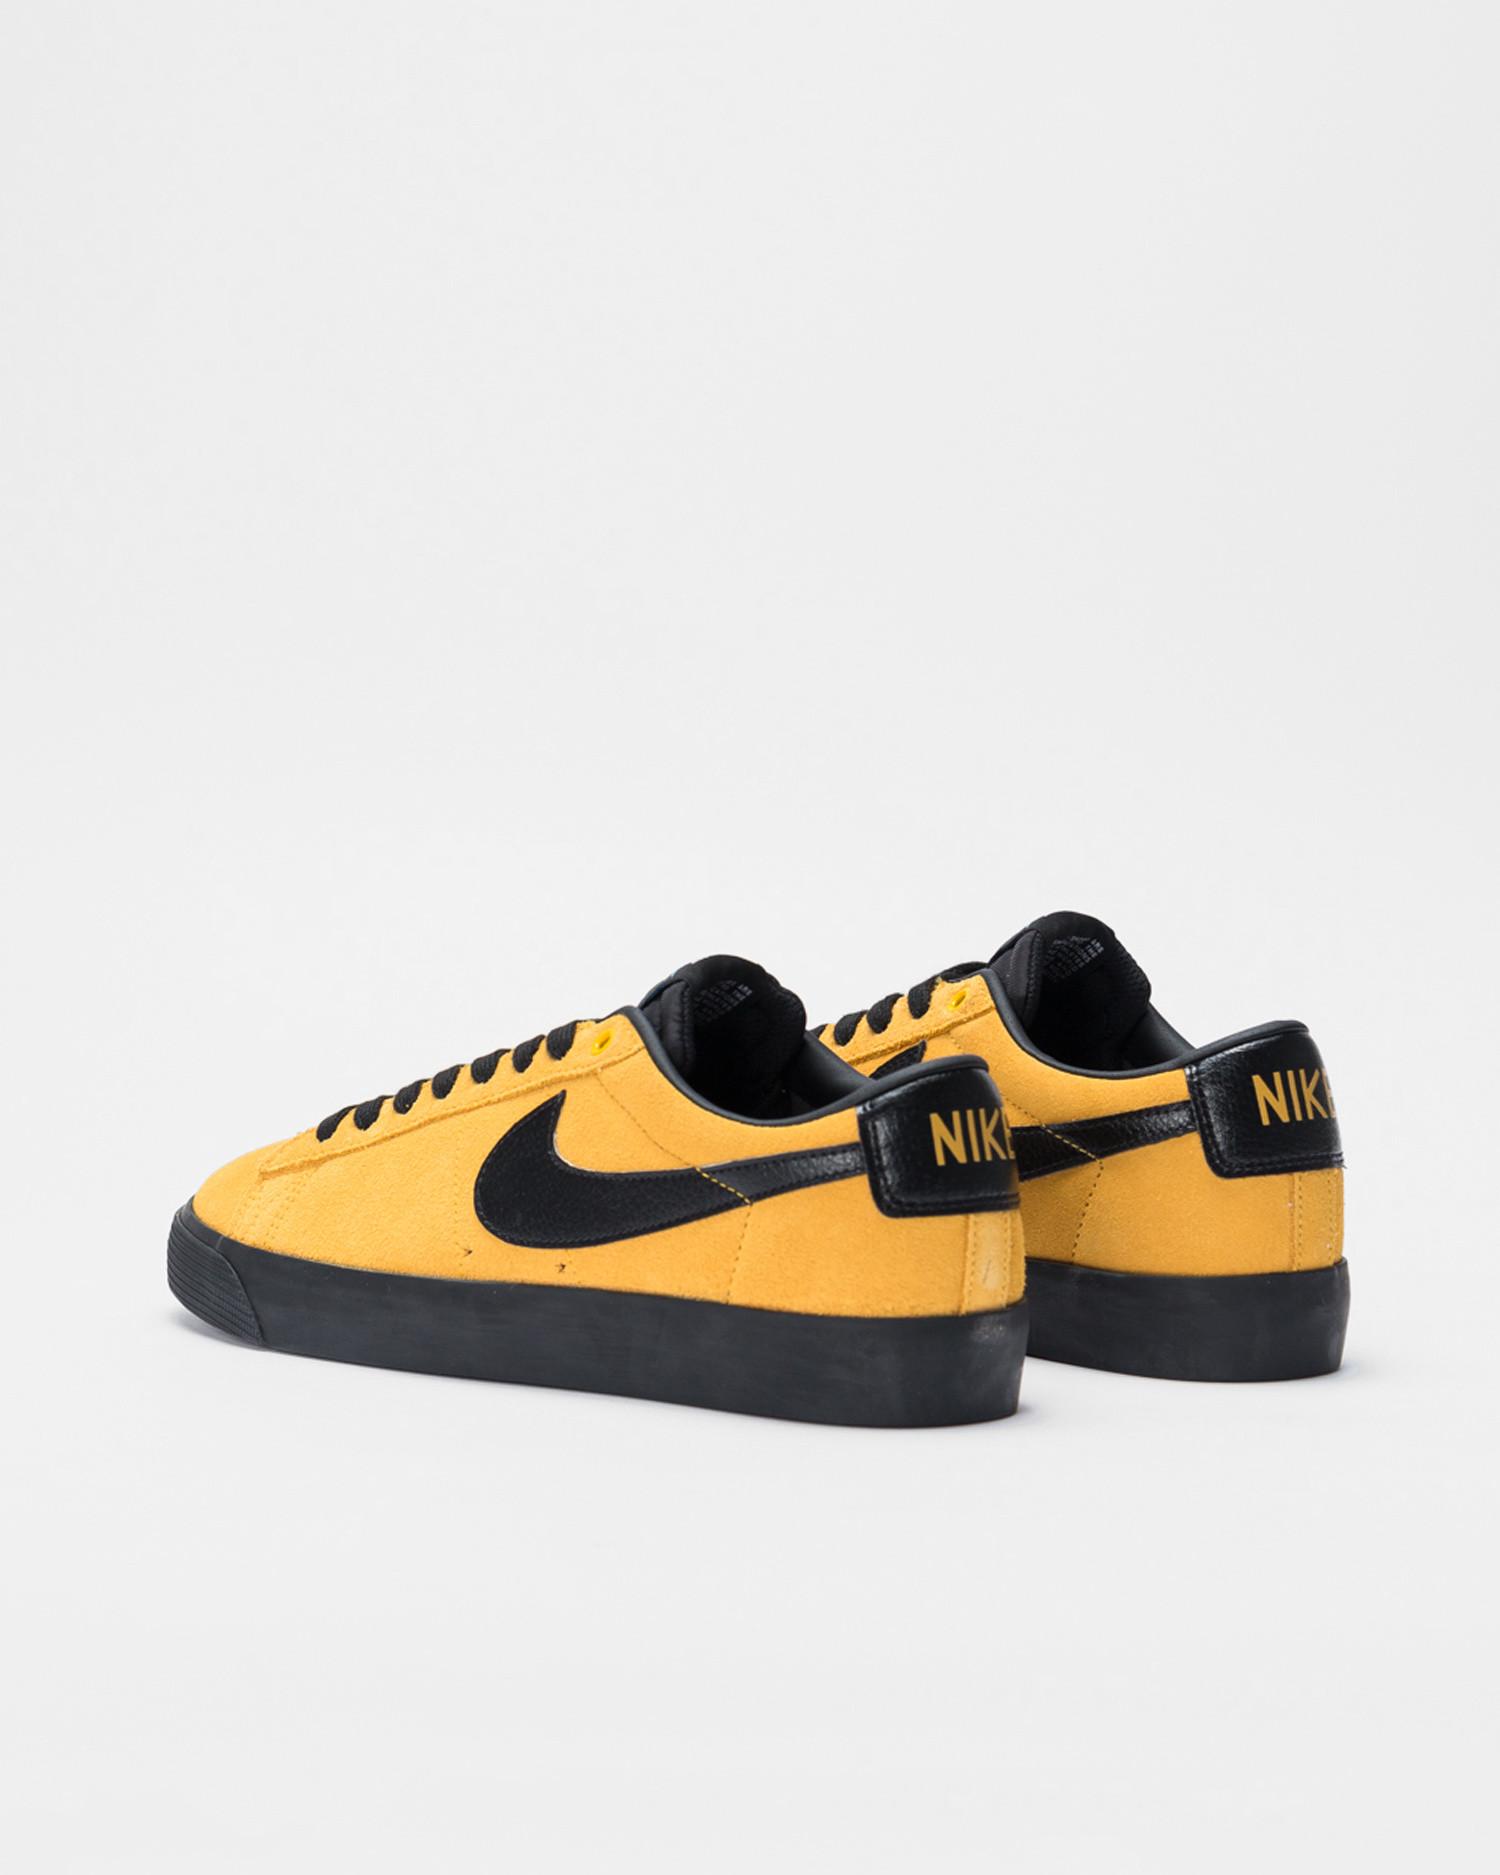 Nike SB Blazer Low Gt University gold/black-university gold